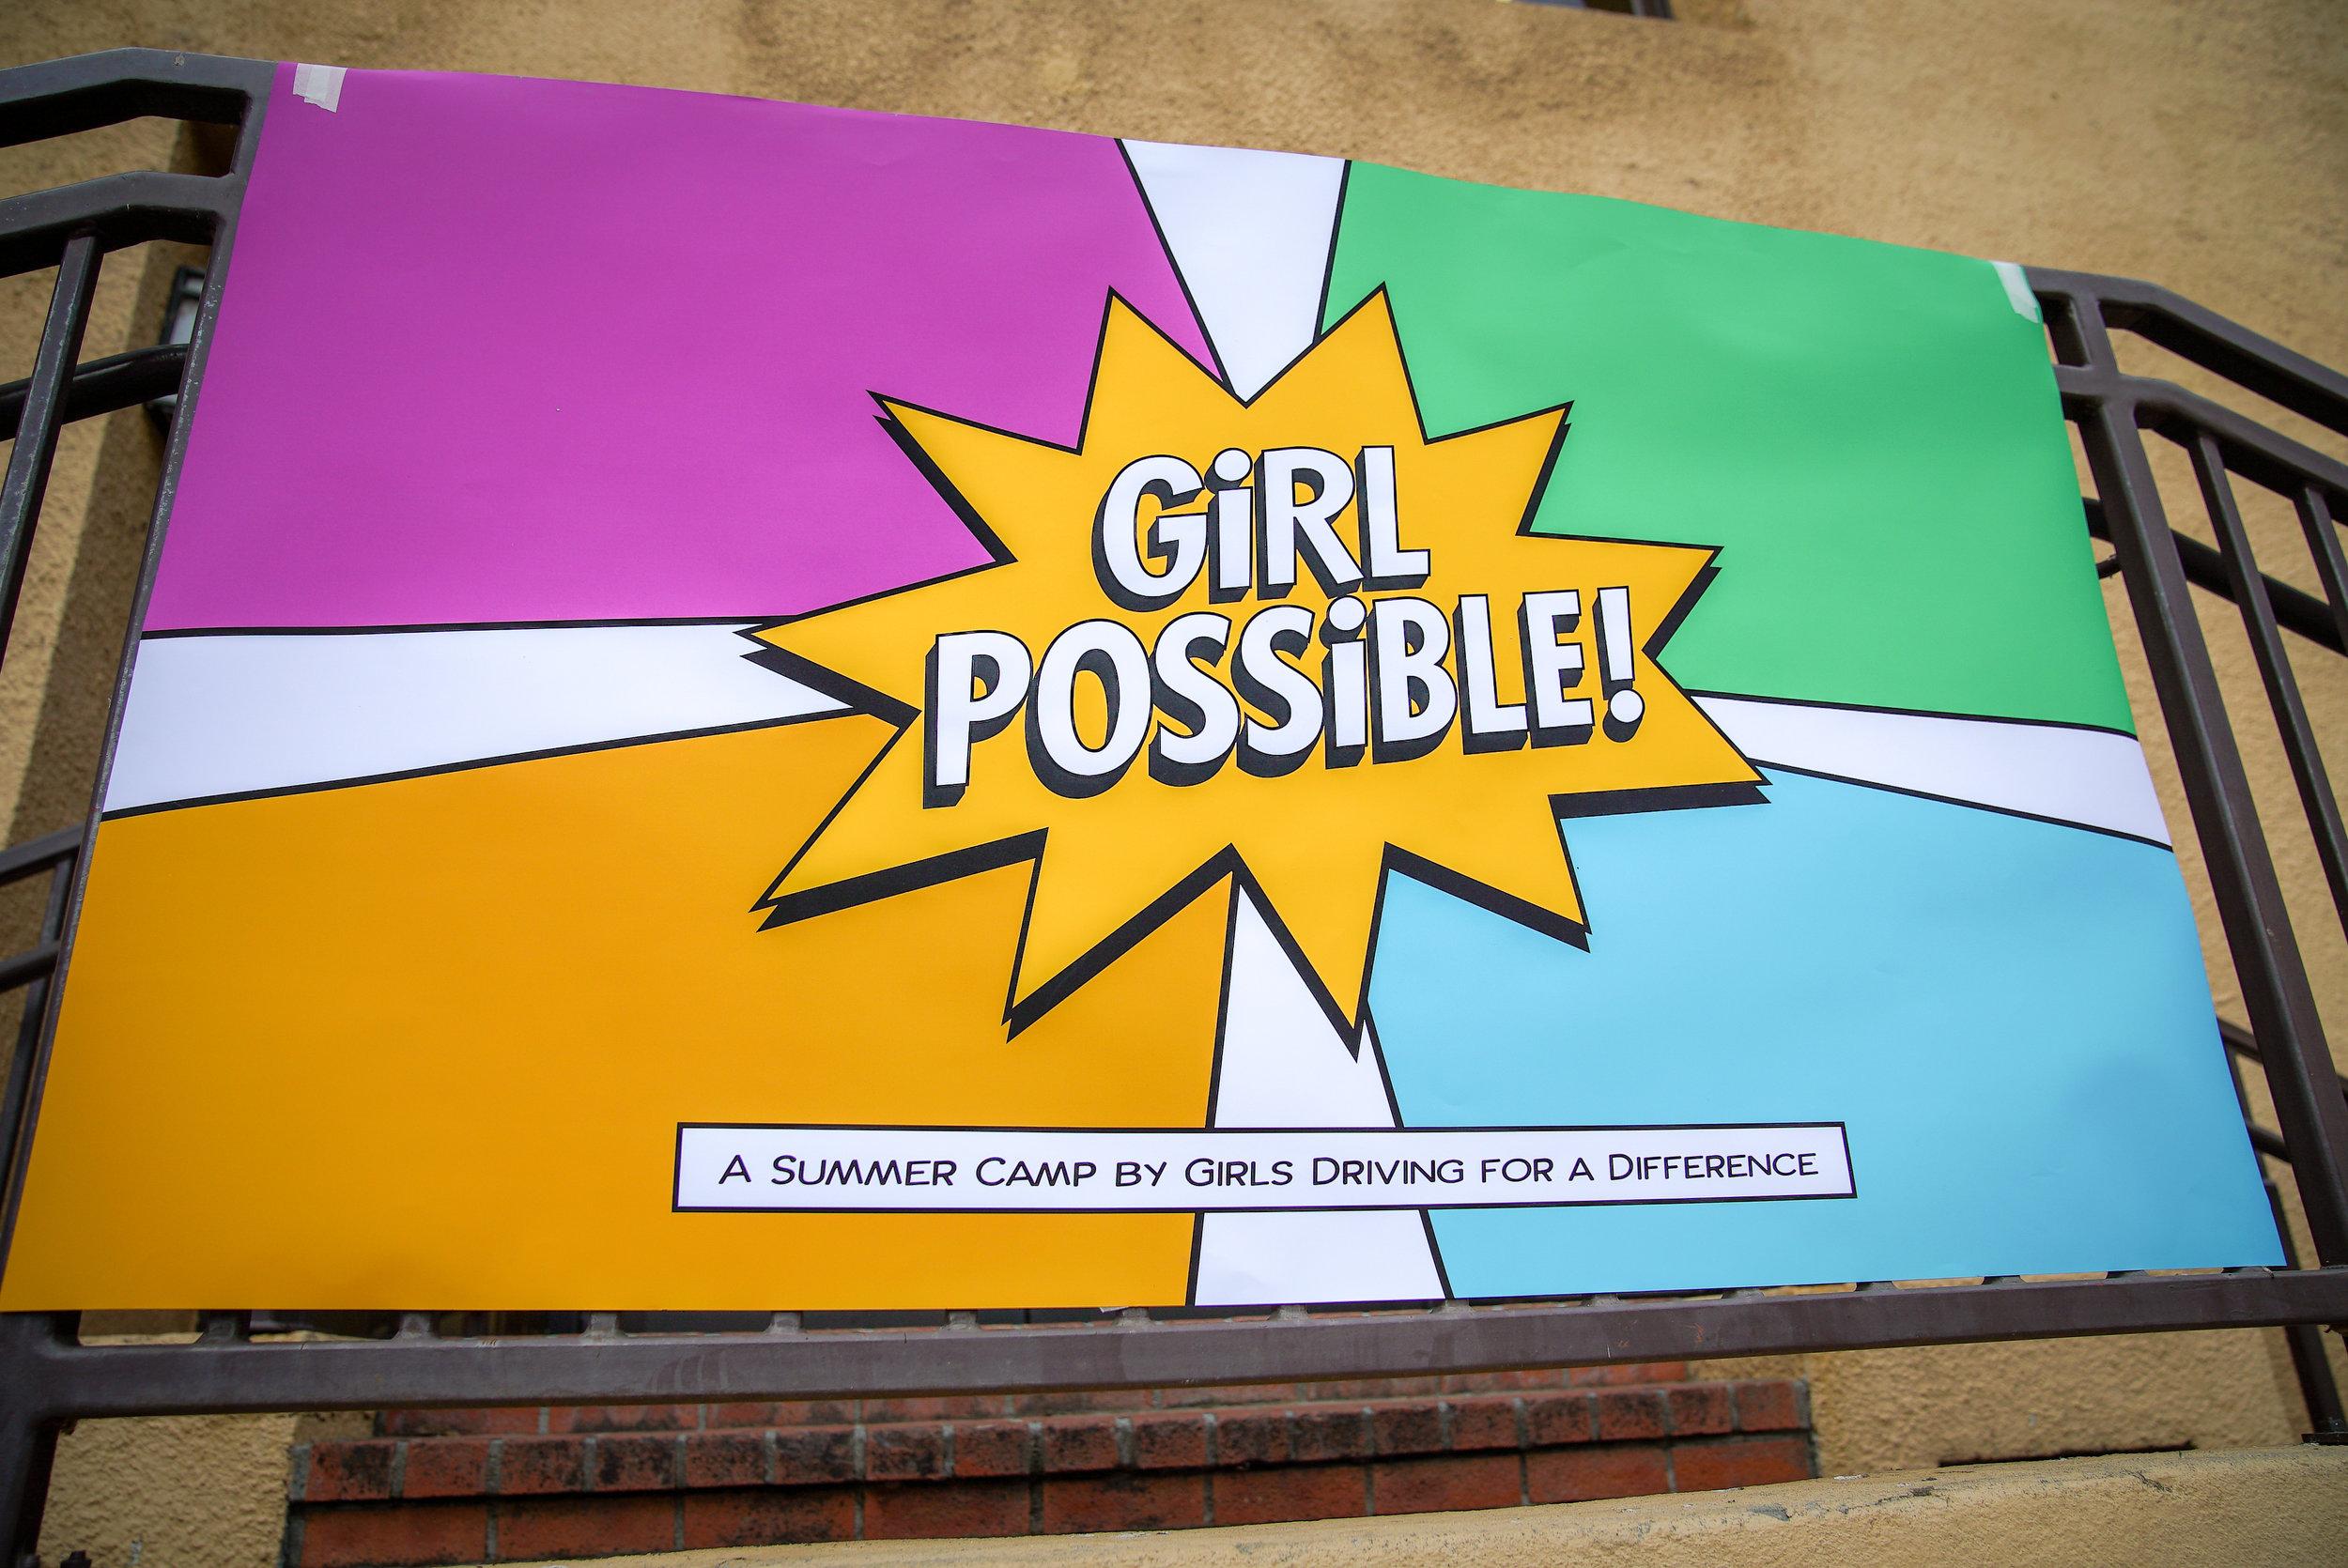 2018.07.31_p_GirlPossible8.jpg